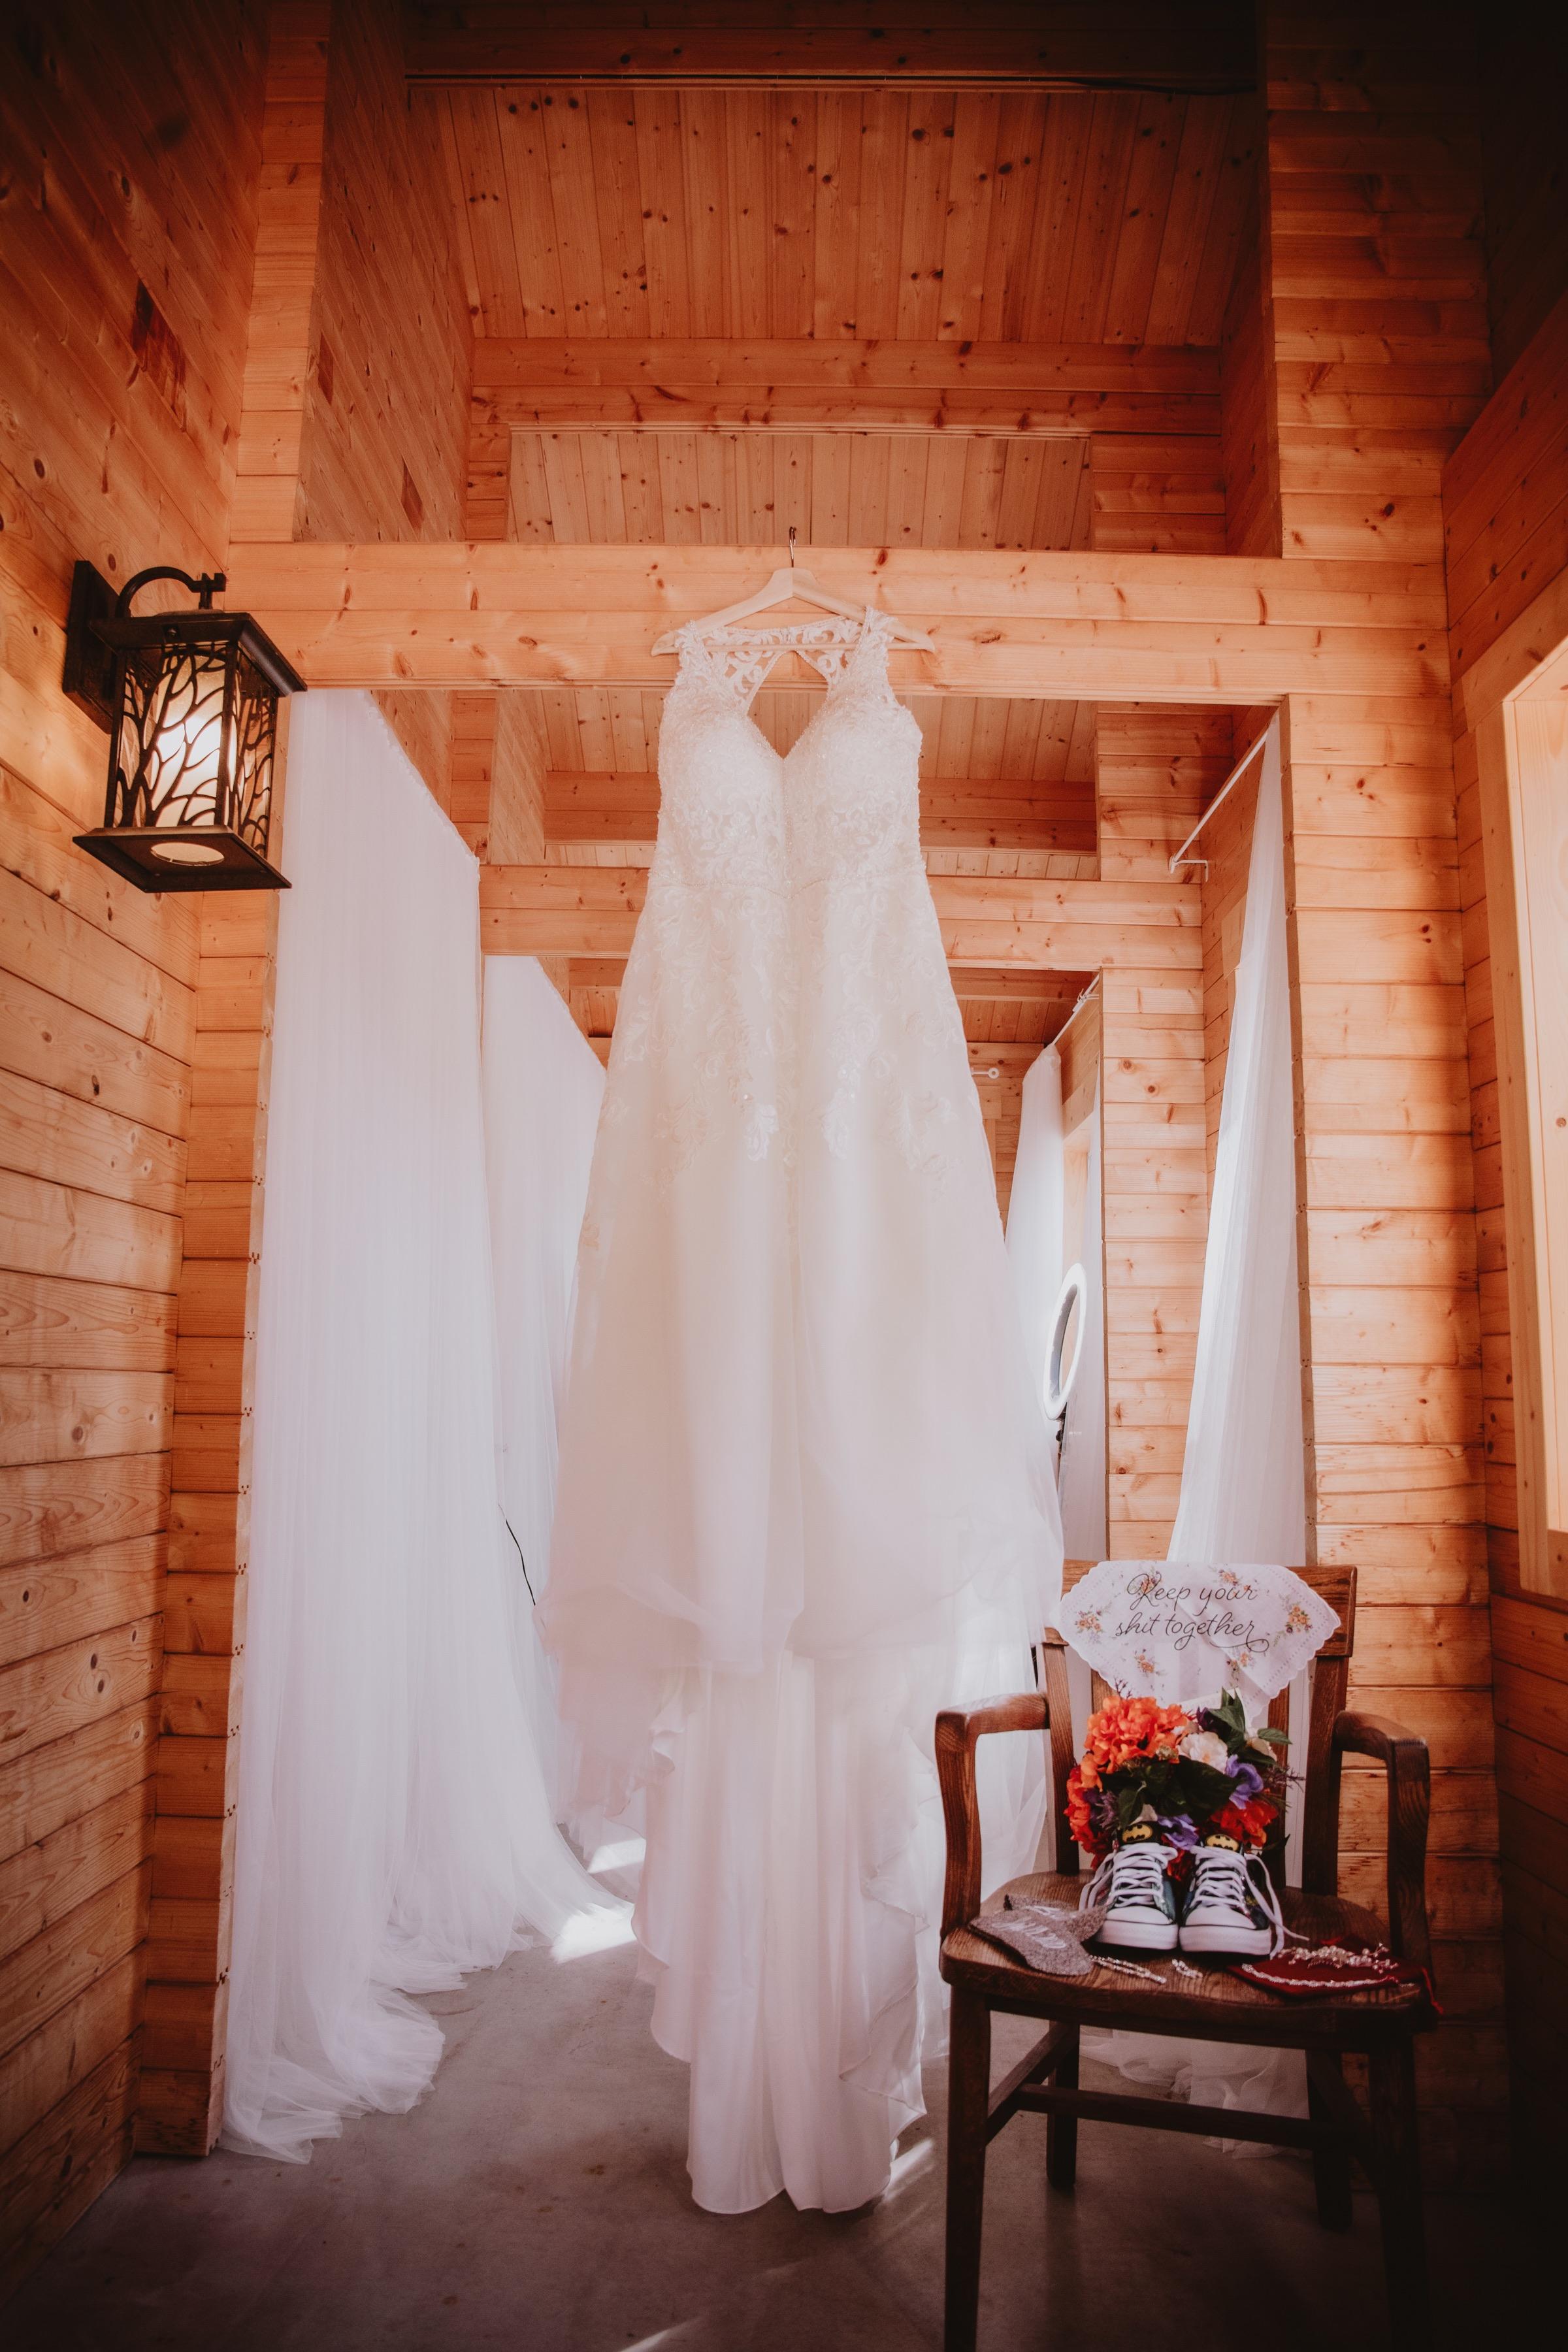 Wedding Gown at Rivers Edge Resort in Elma, Manitoba.